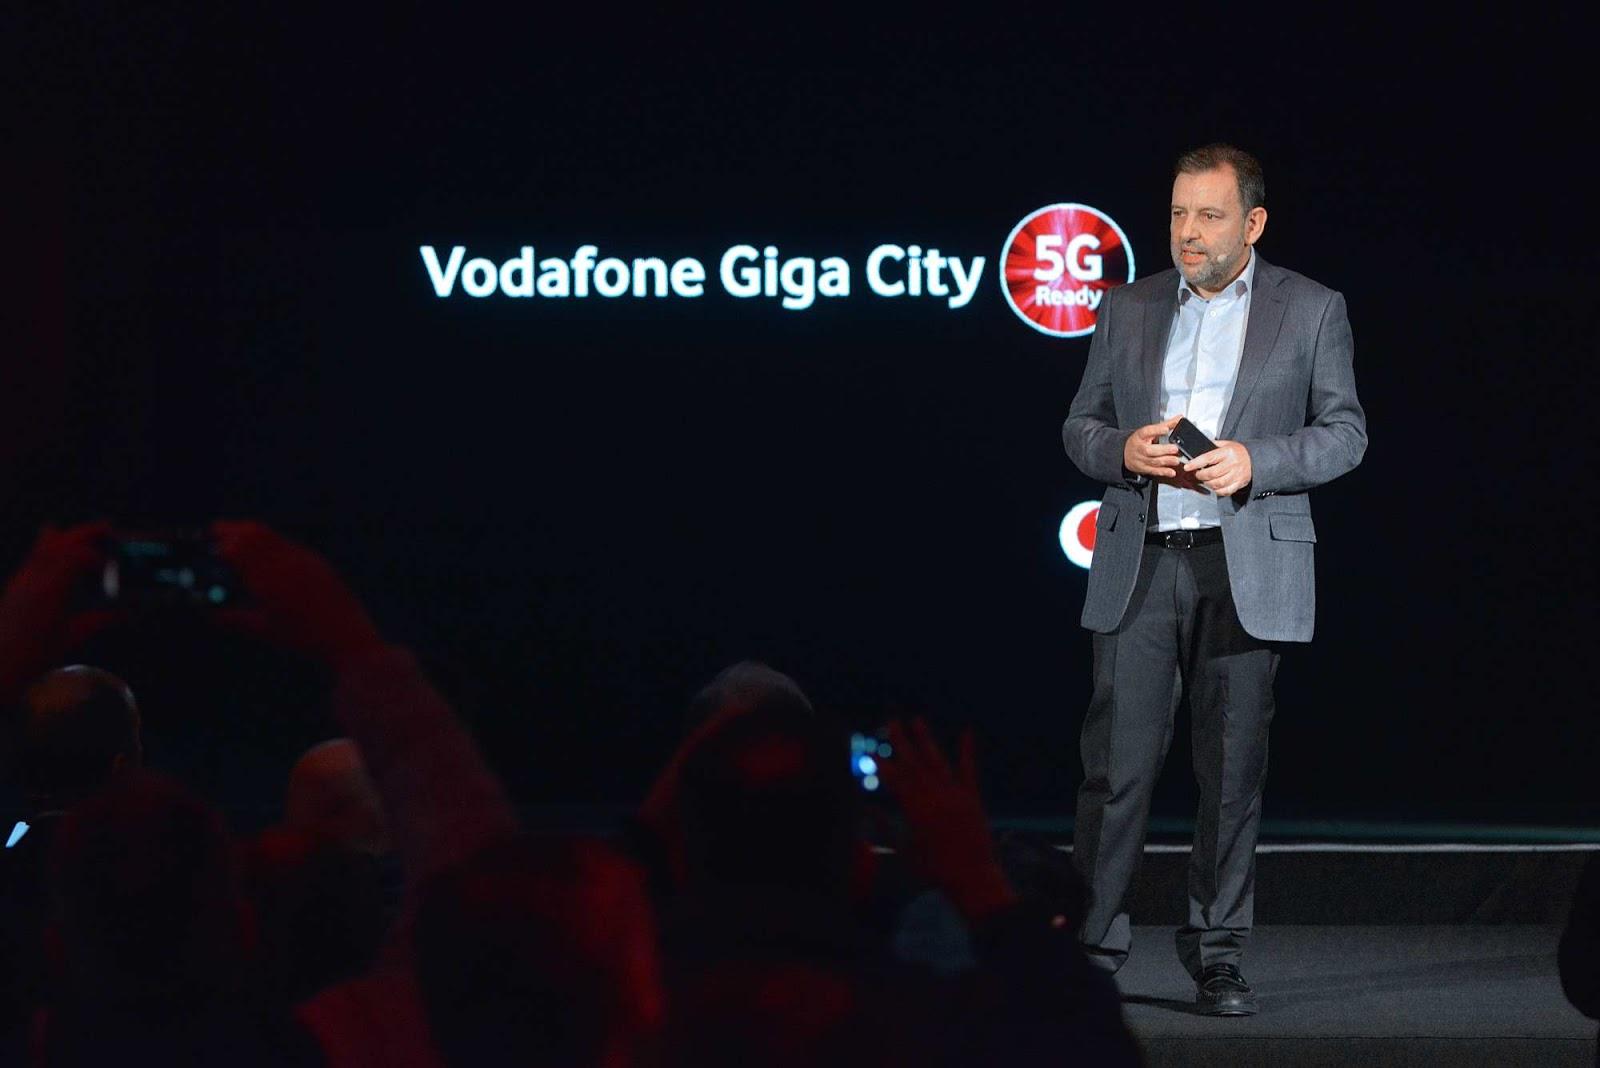 Vodafone Giga City 5G στα Τρίκαλα! (ΦΩΤΟ)